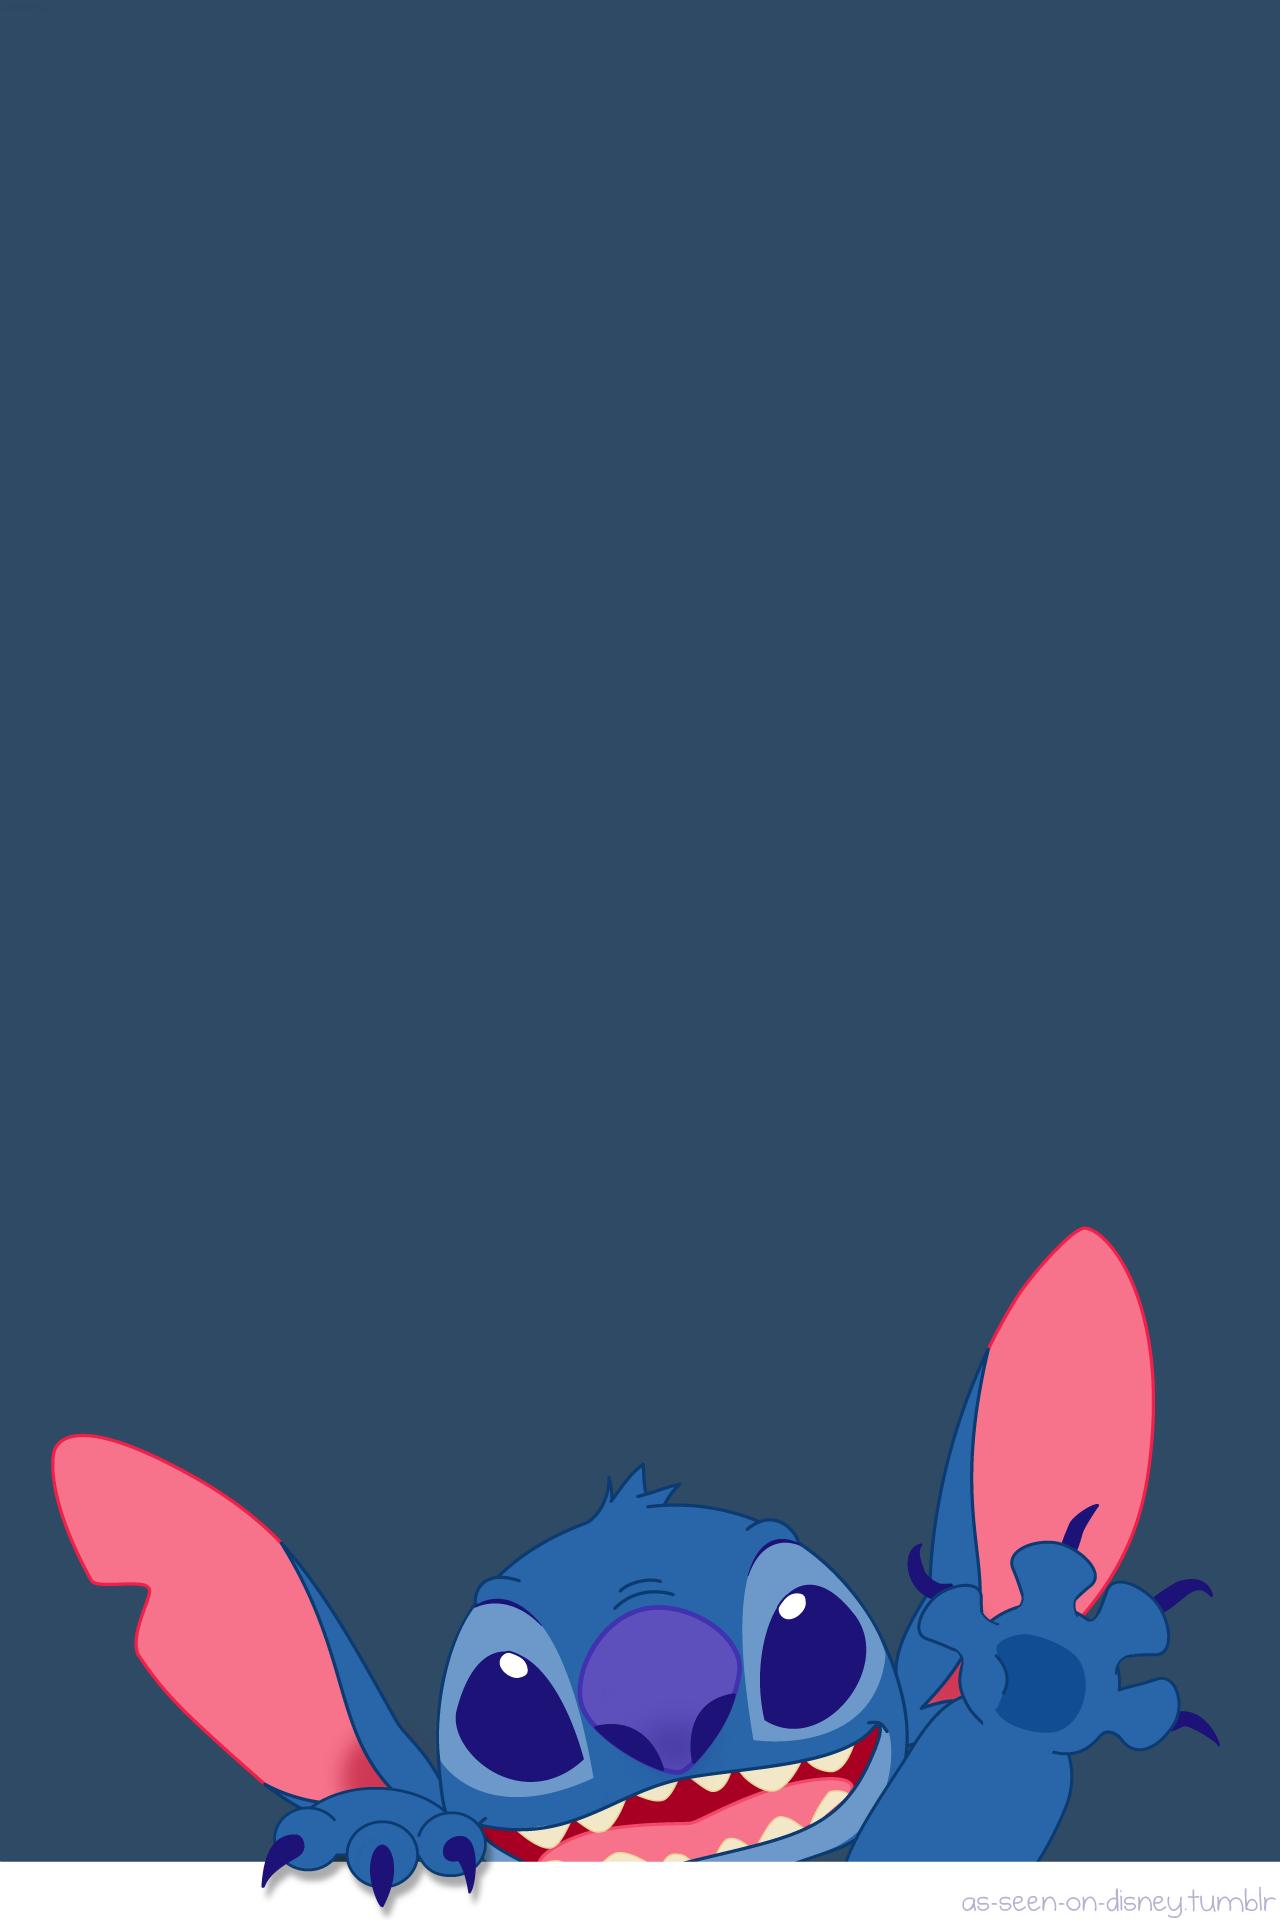 Wallpaper iphone stitch - Disney Wallpaper